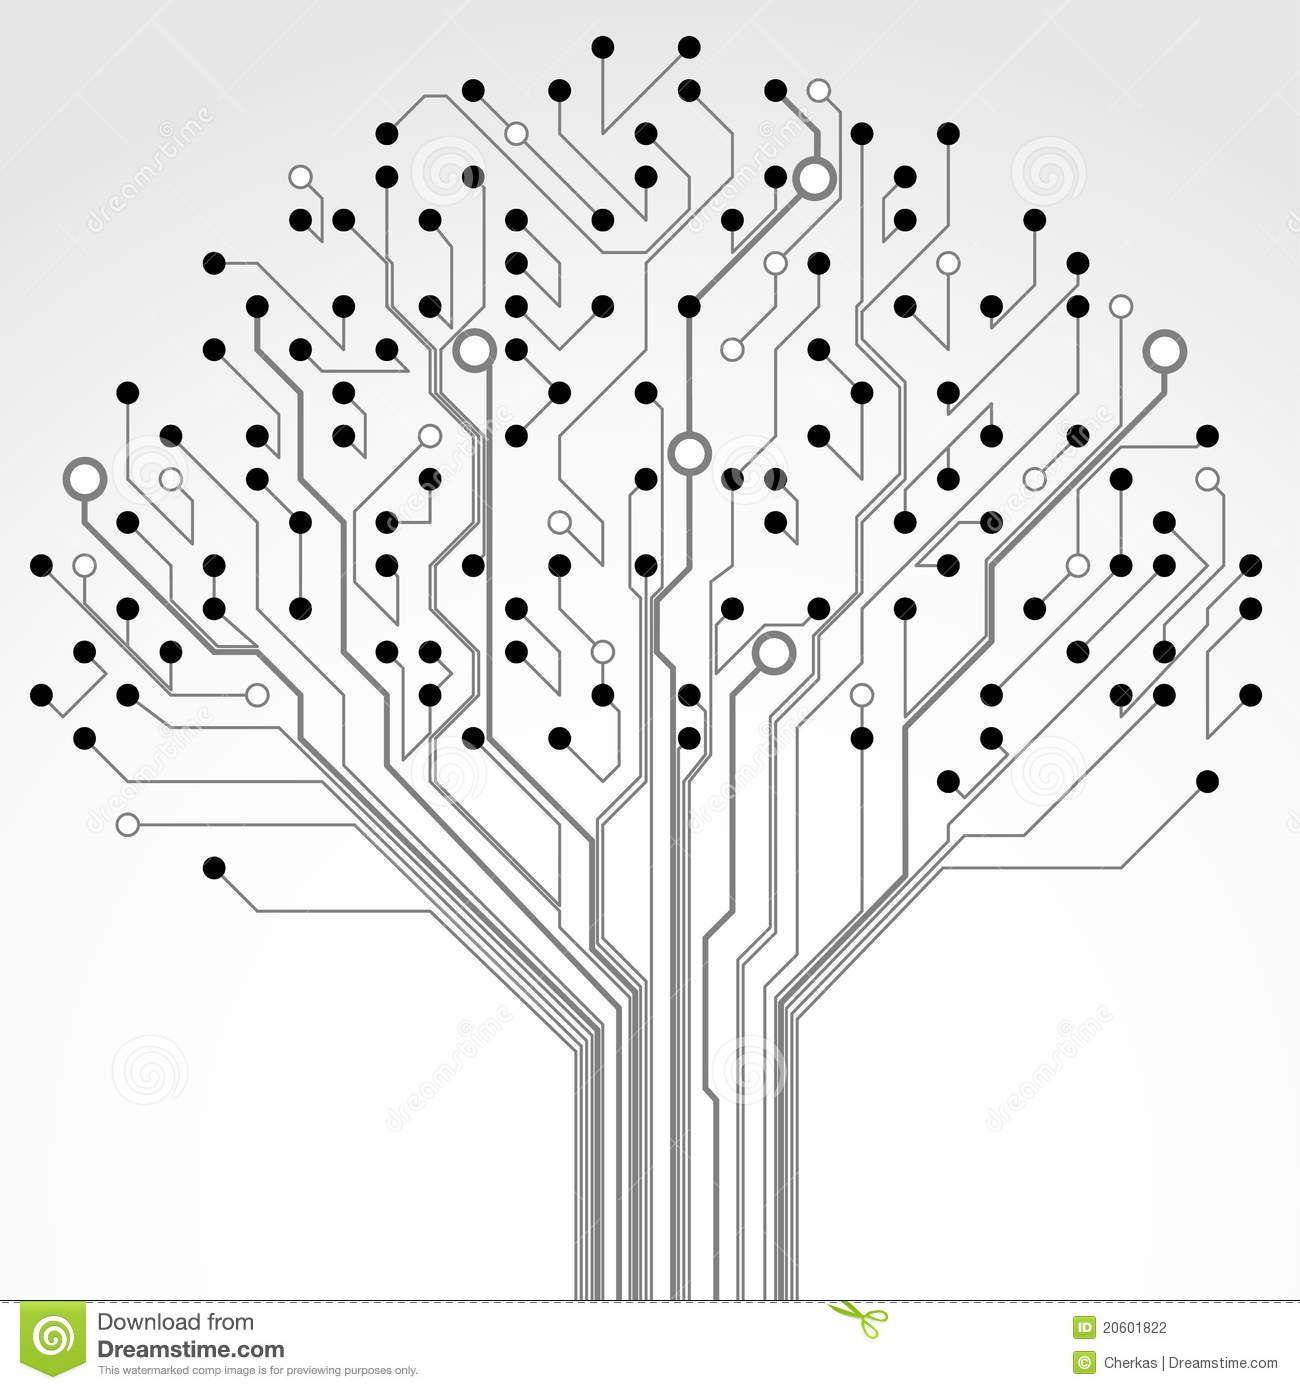 circuit - Google-Suche   App Design Ideas   Pinterest   Circuits ...